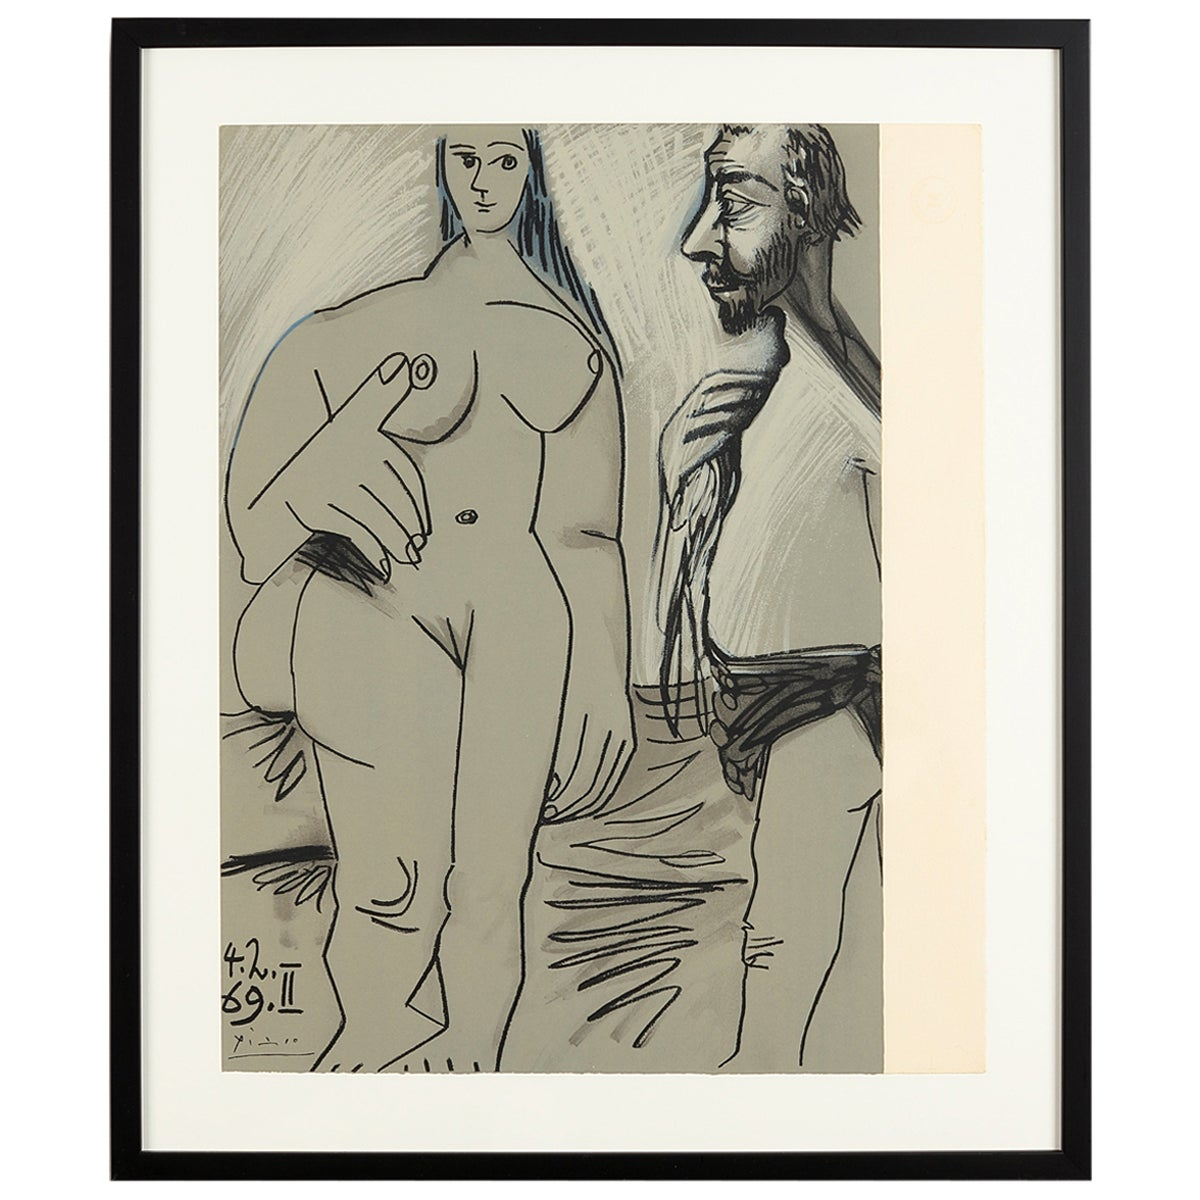 Pablo Picasso 'after' from Au Baiser d'Avignon